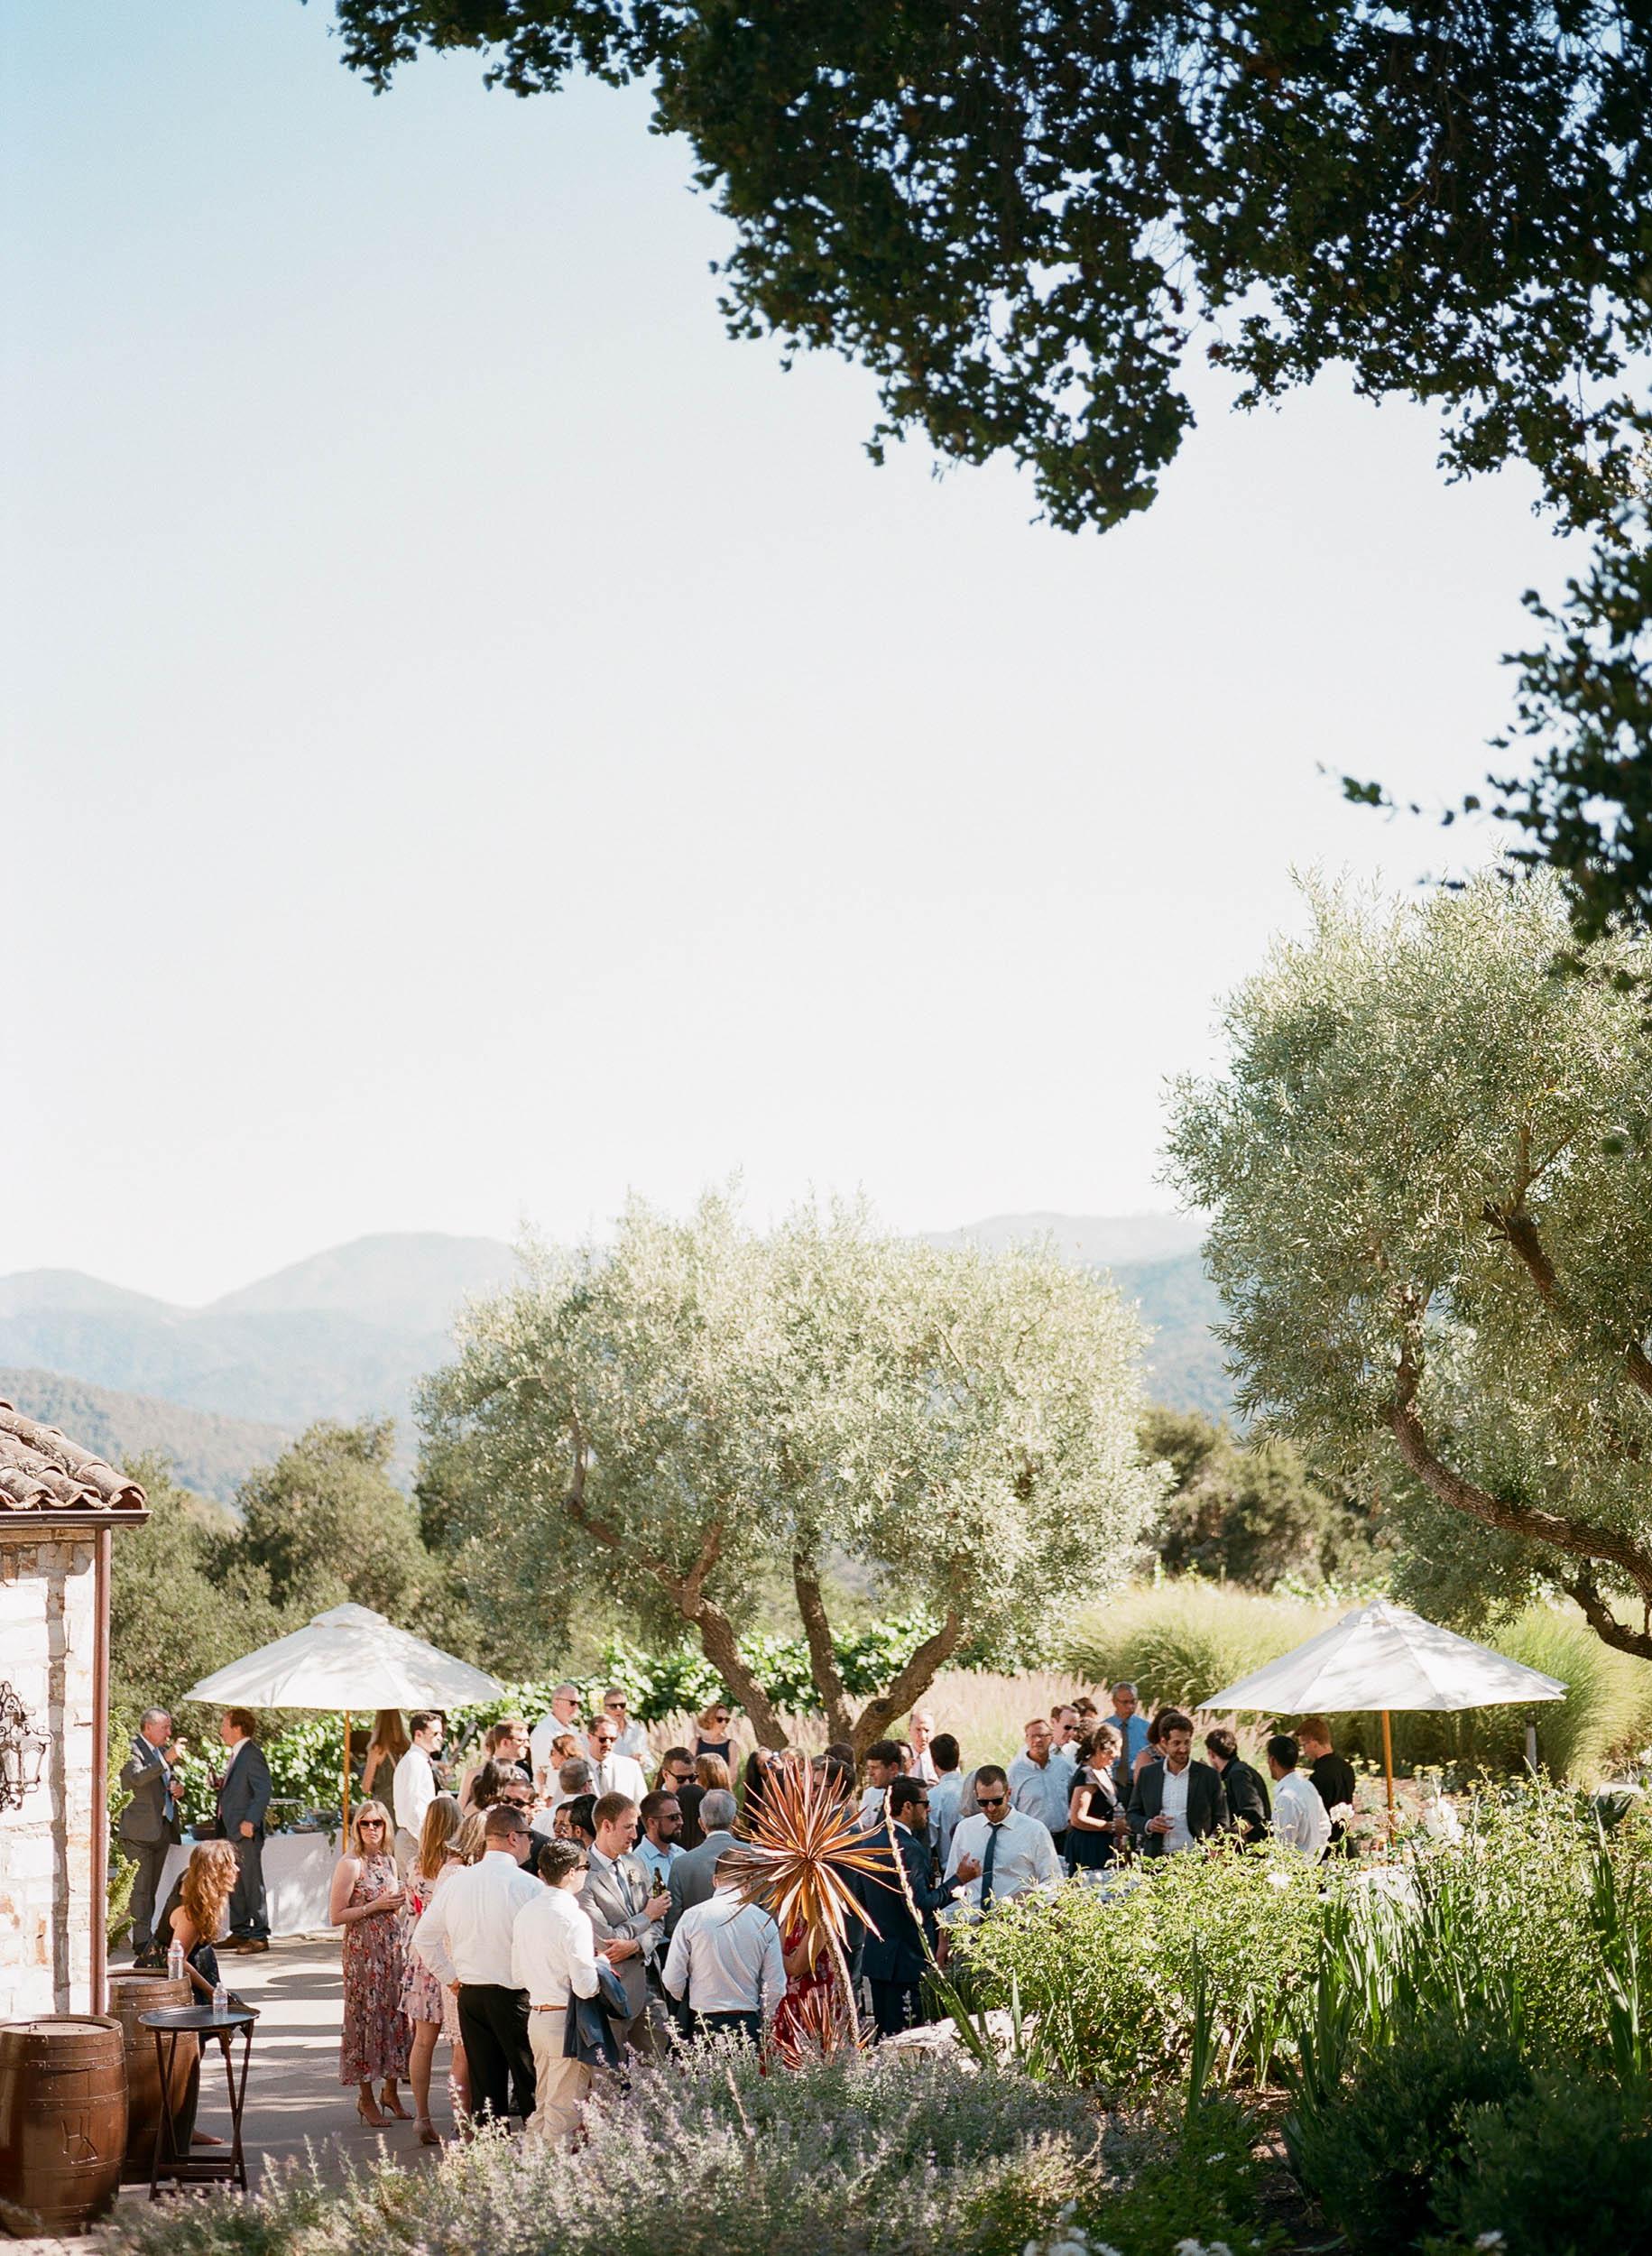 053_072118_D+K_Holman Ranch Wedding_Buena Lane Photography_00005430_71 copy.jpg